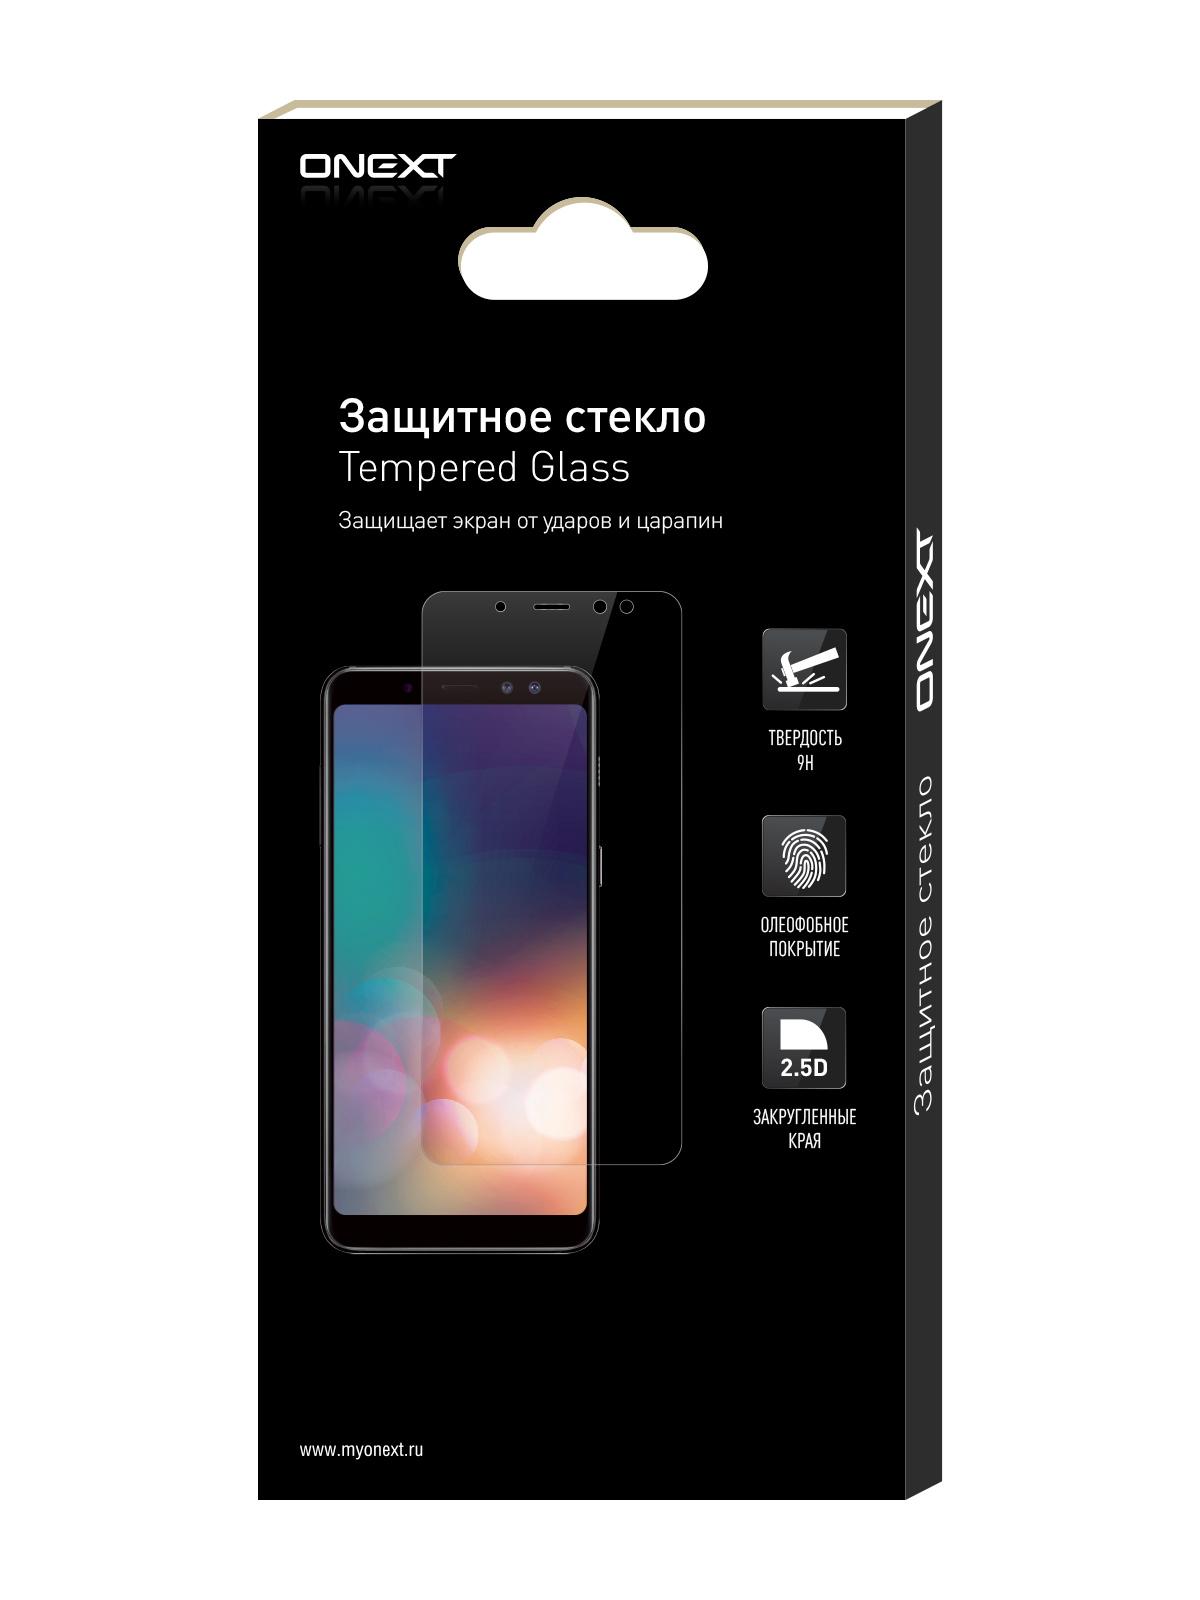 Защитное стекло ONEXT HTC Desire 828 поворот экрана htc